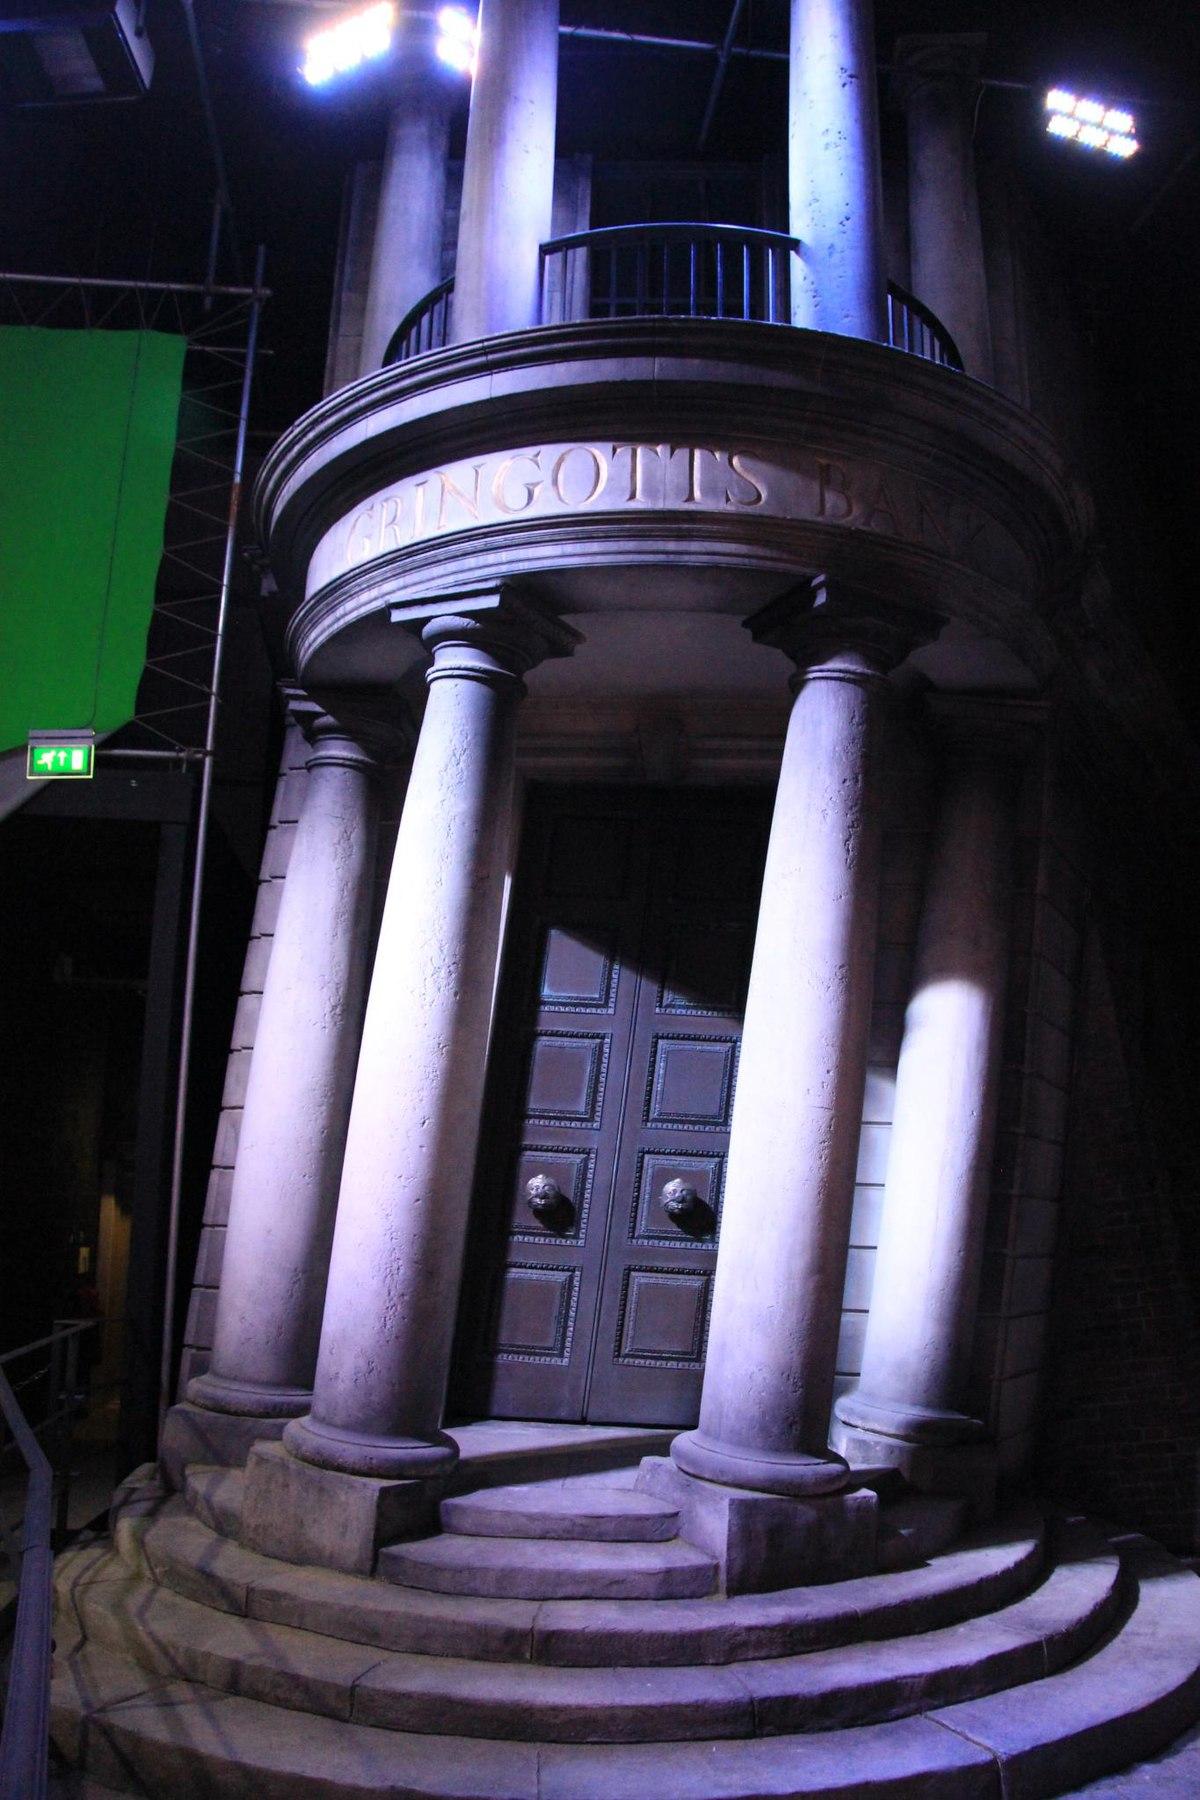 Harry Potter i Insygni... Rupert Grint